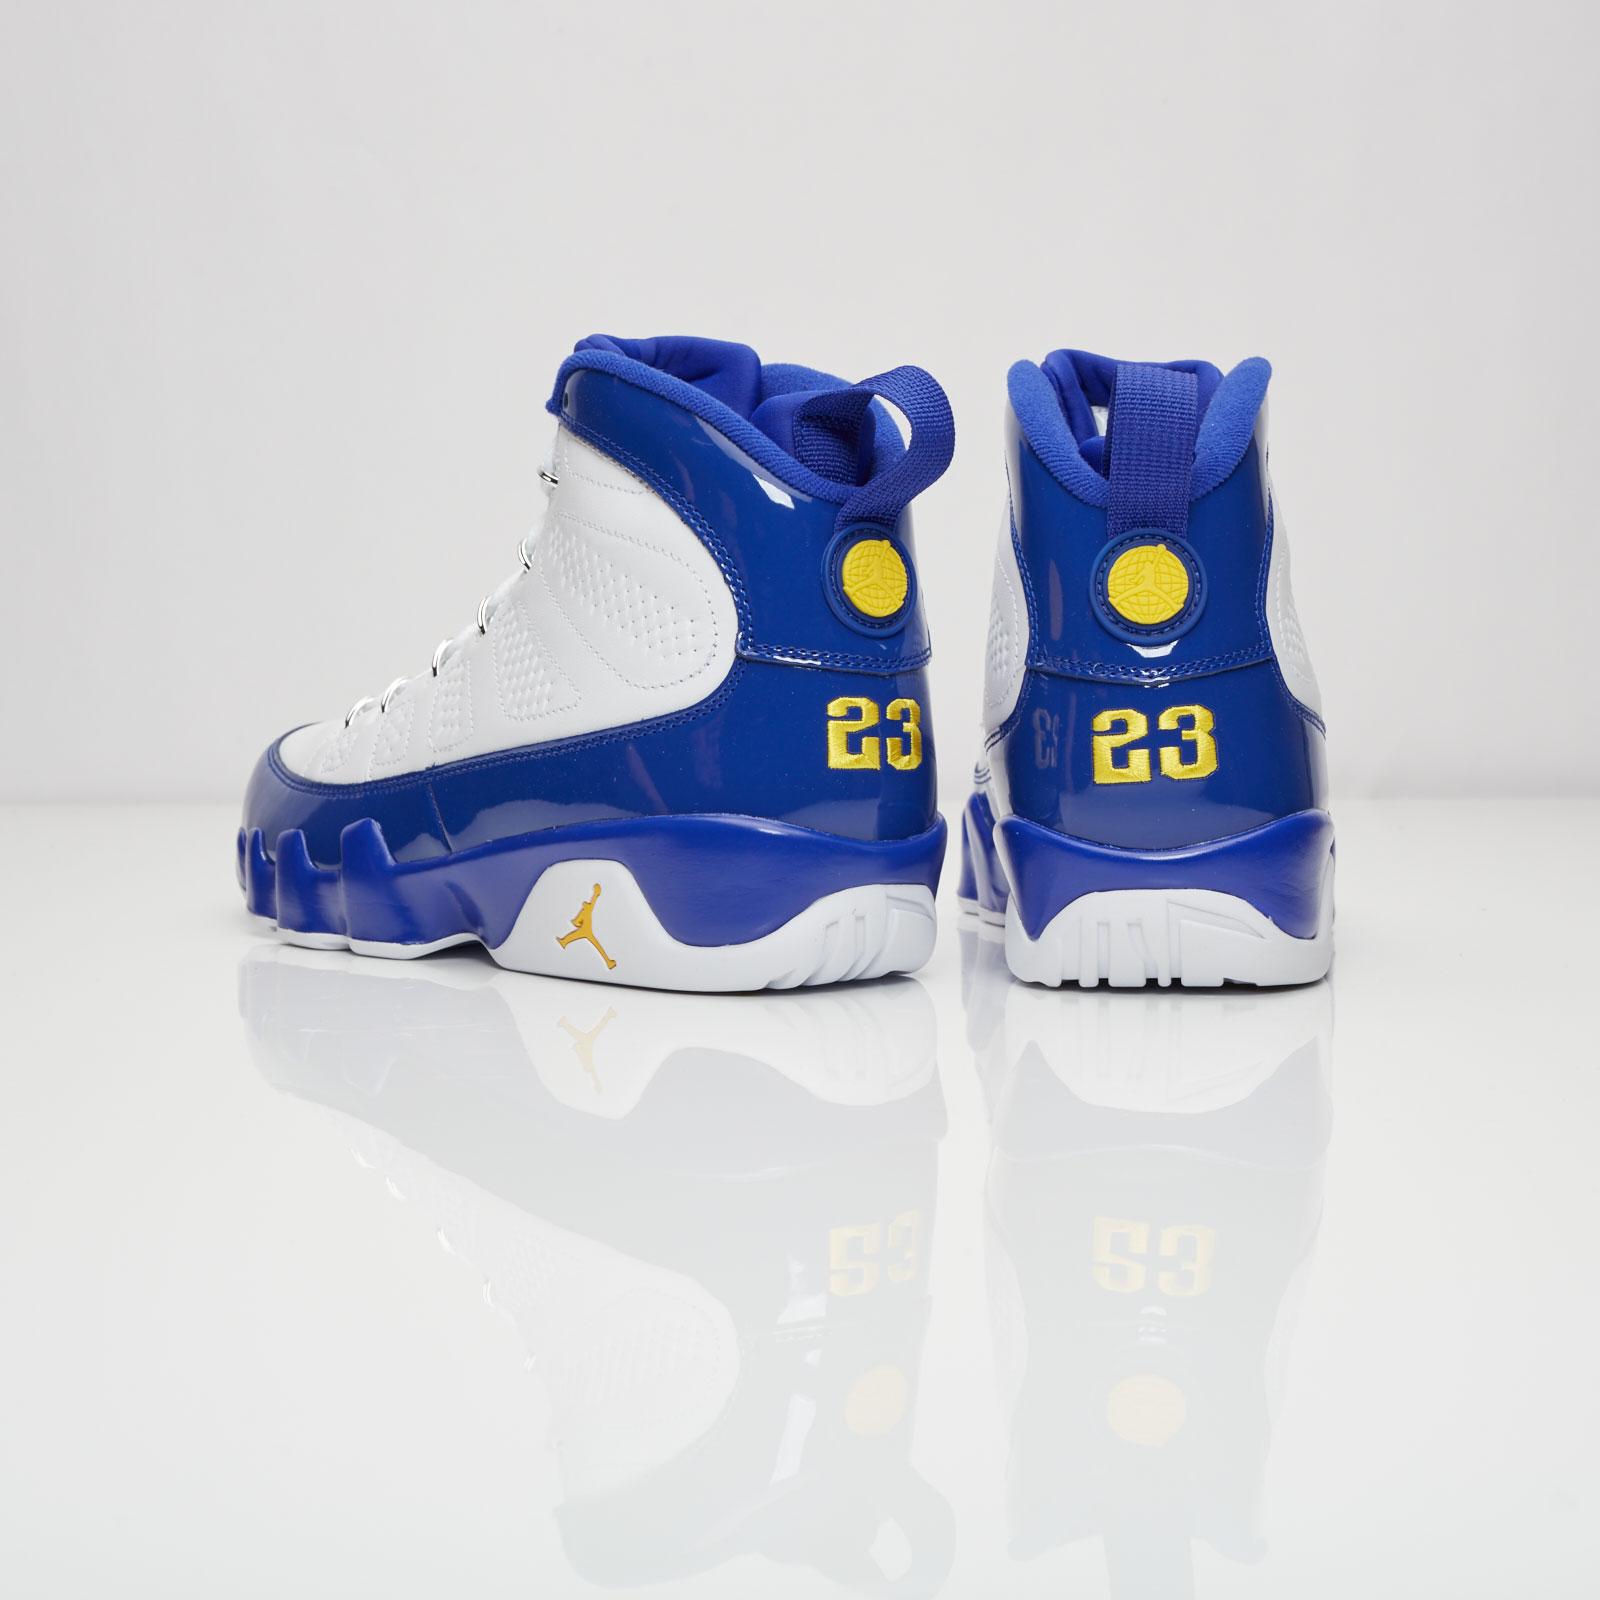 the latest 92c28 81614 Jordan Brand Air Jordan 9 Retro - 302370-121 - Sneakersnstuff   sneakers    streetwear online since 1999